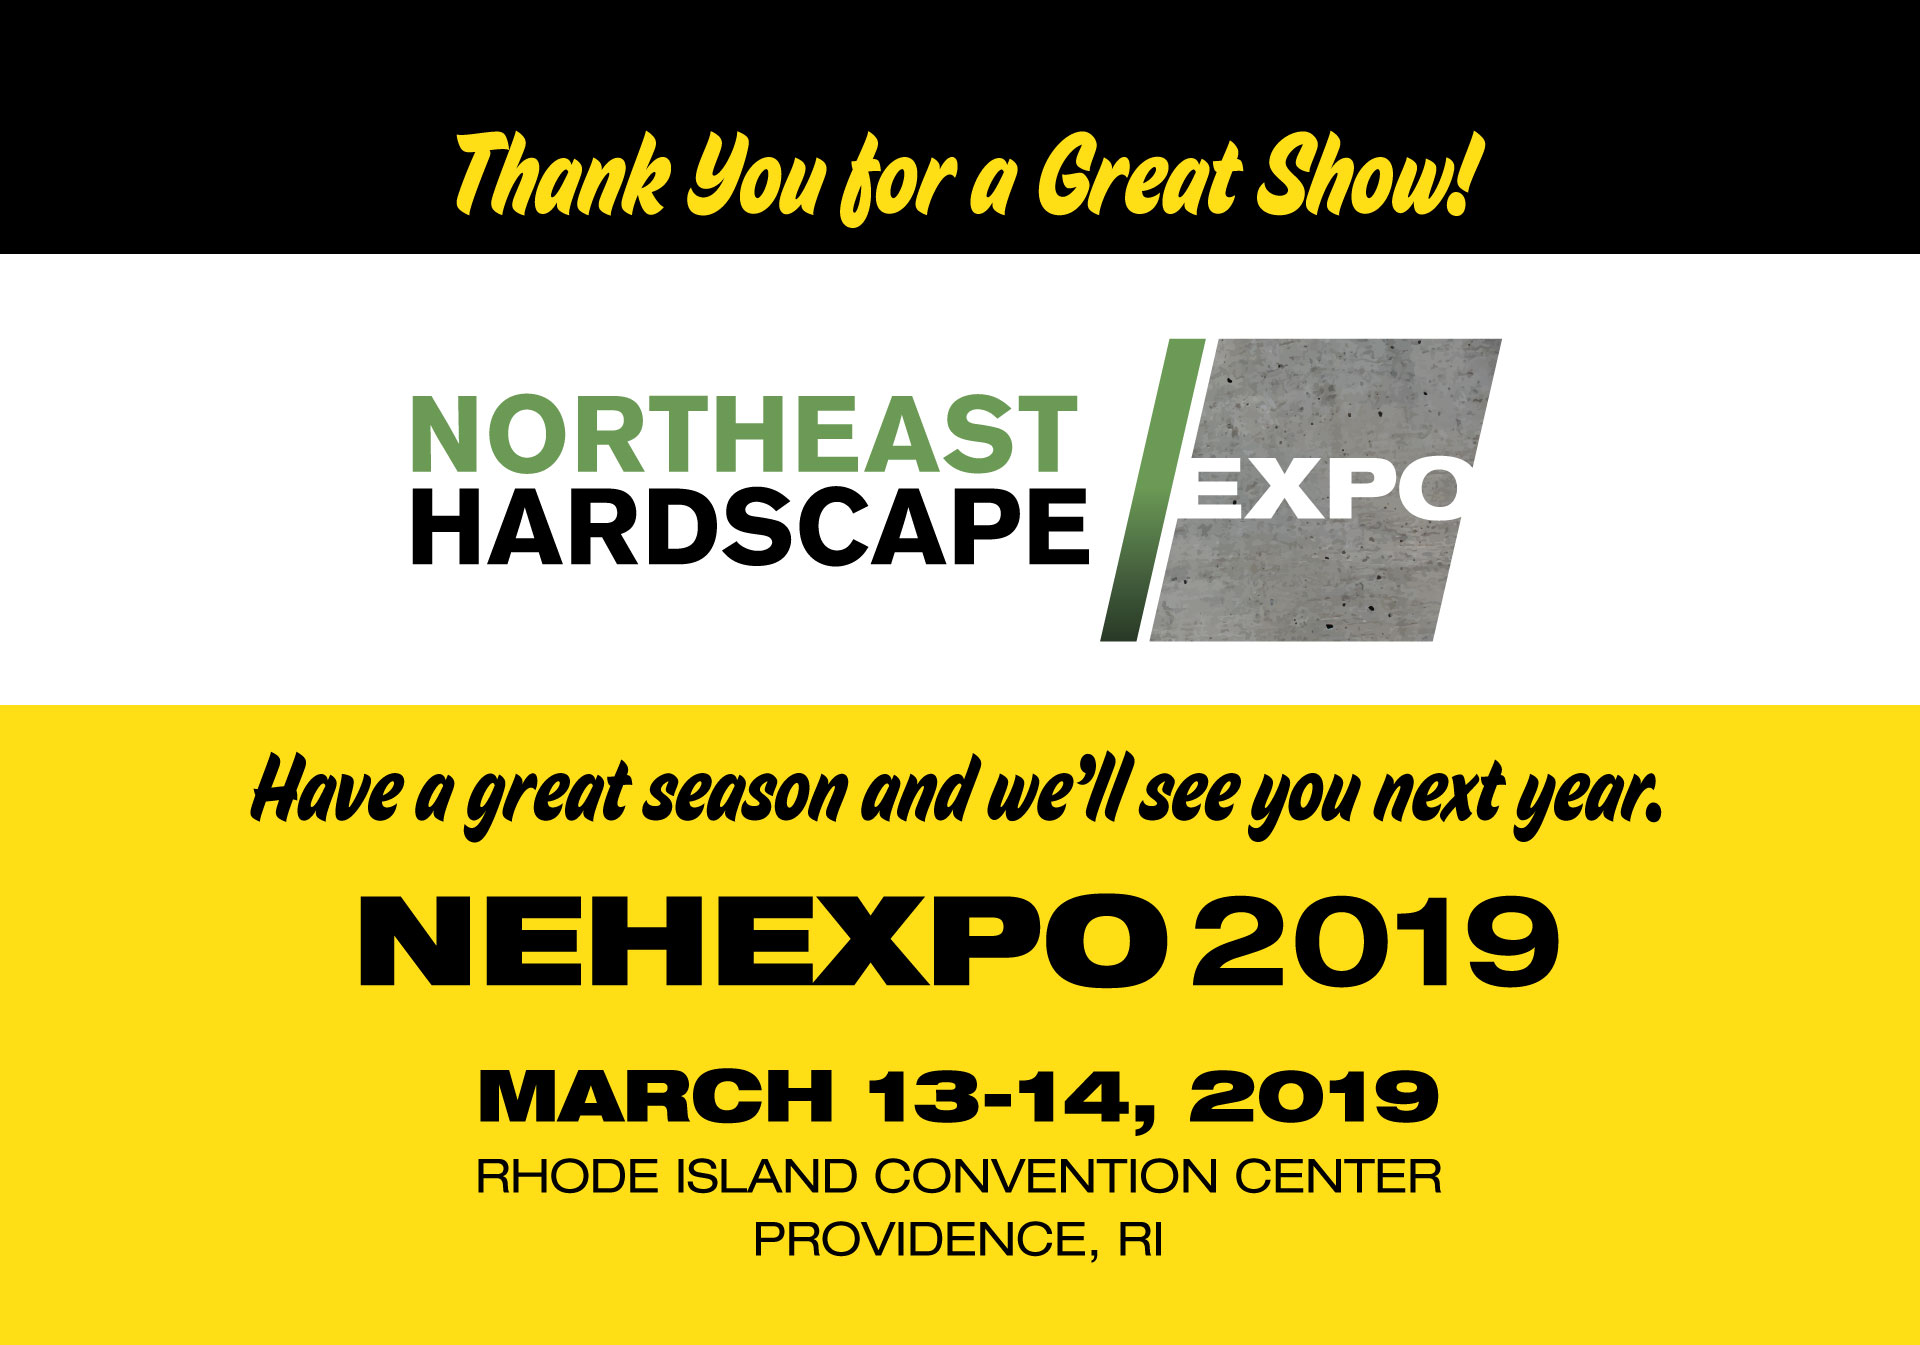 Northeast Hardscape Expo